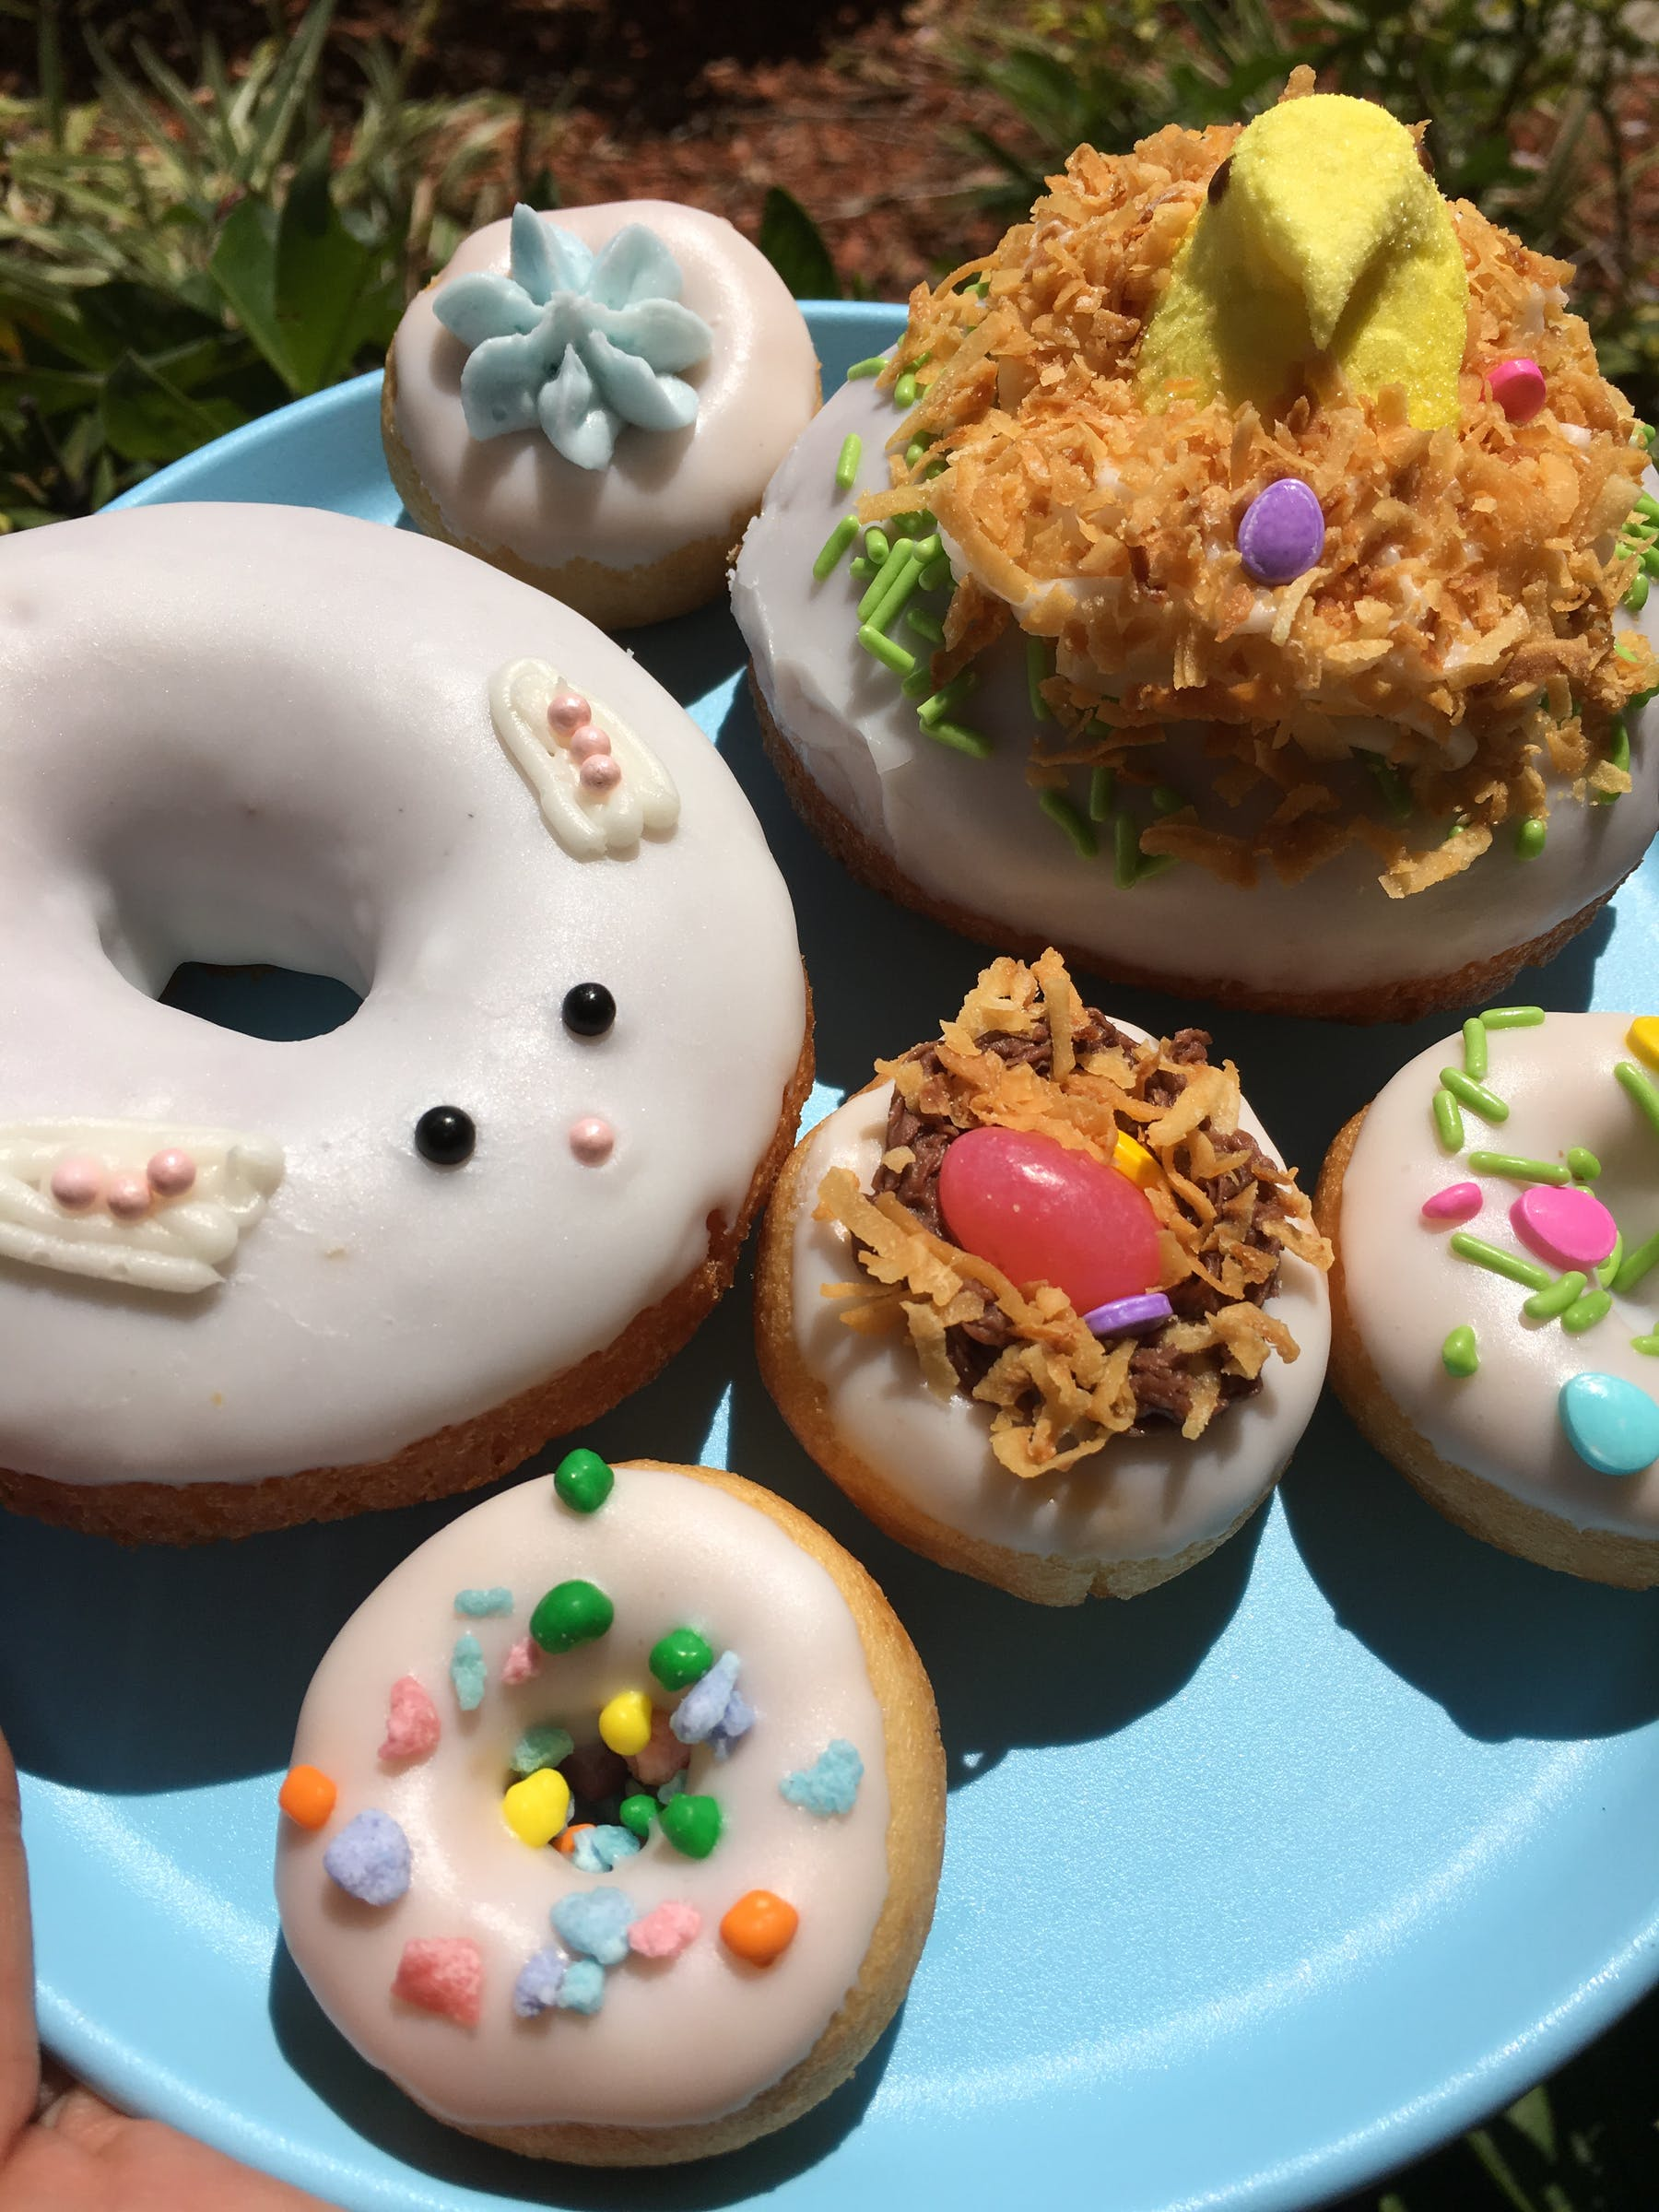 a close up of a doughnut on a plate